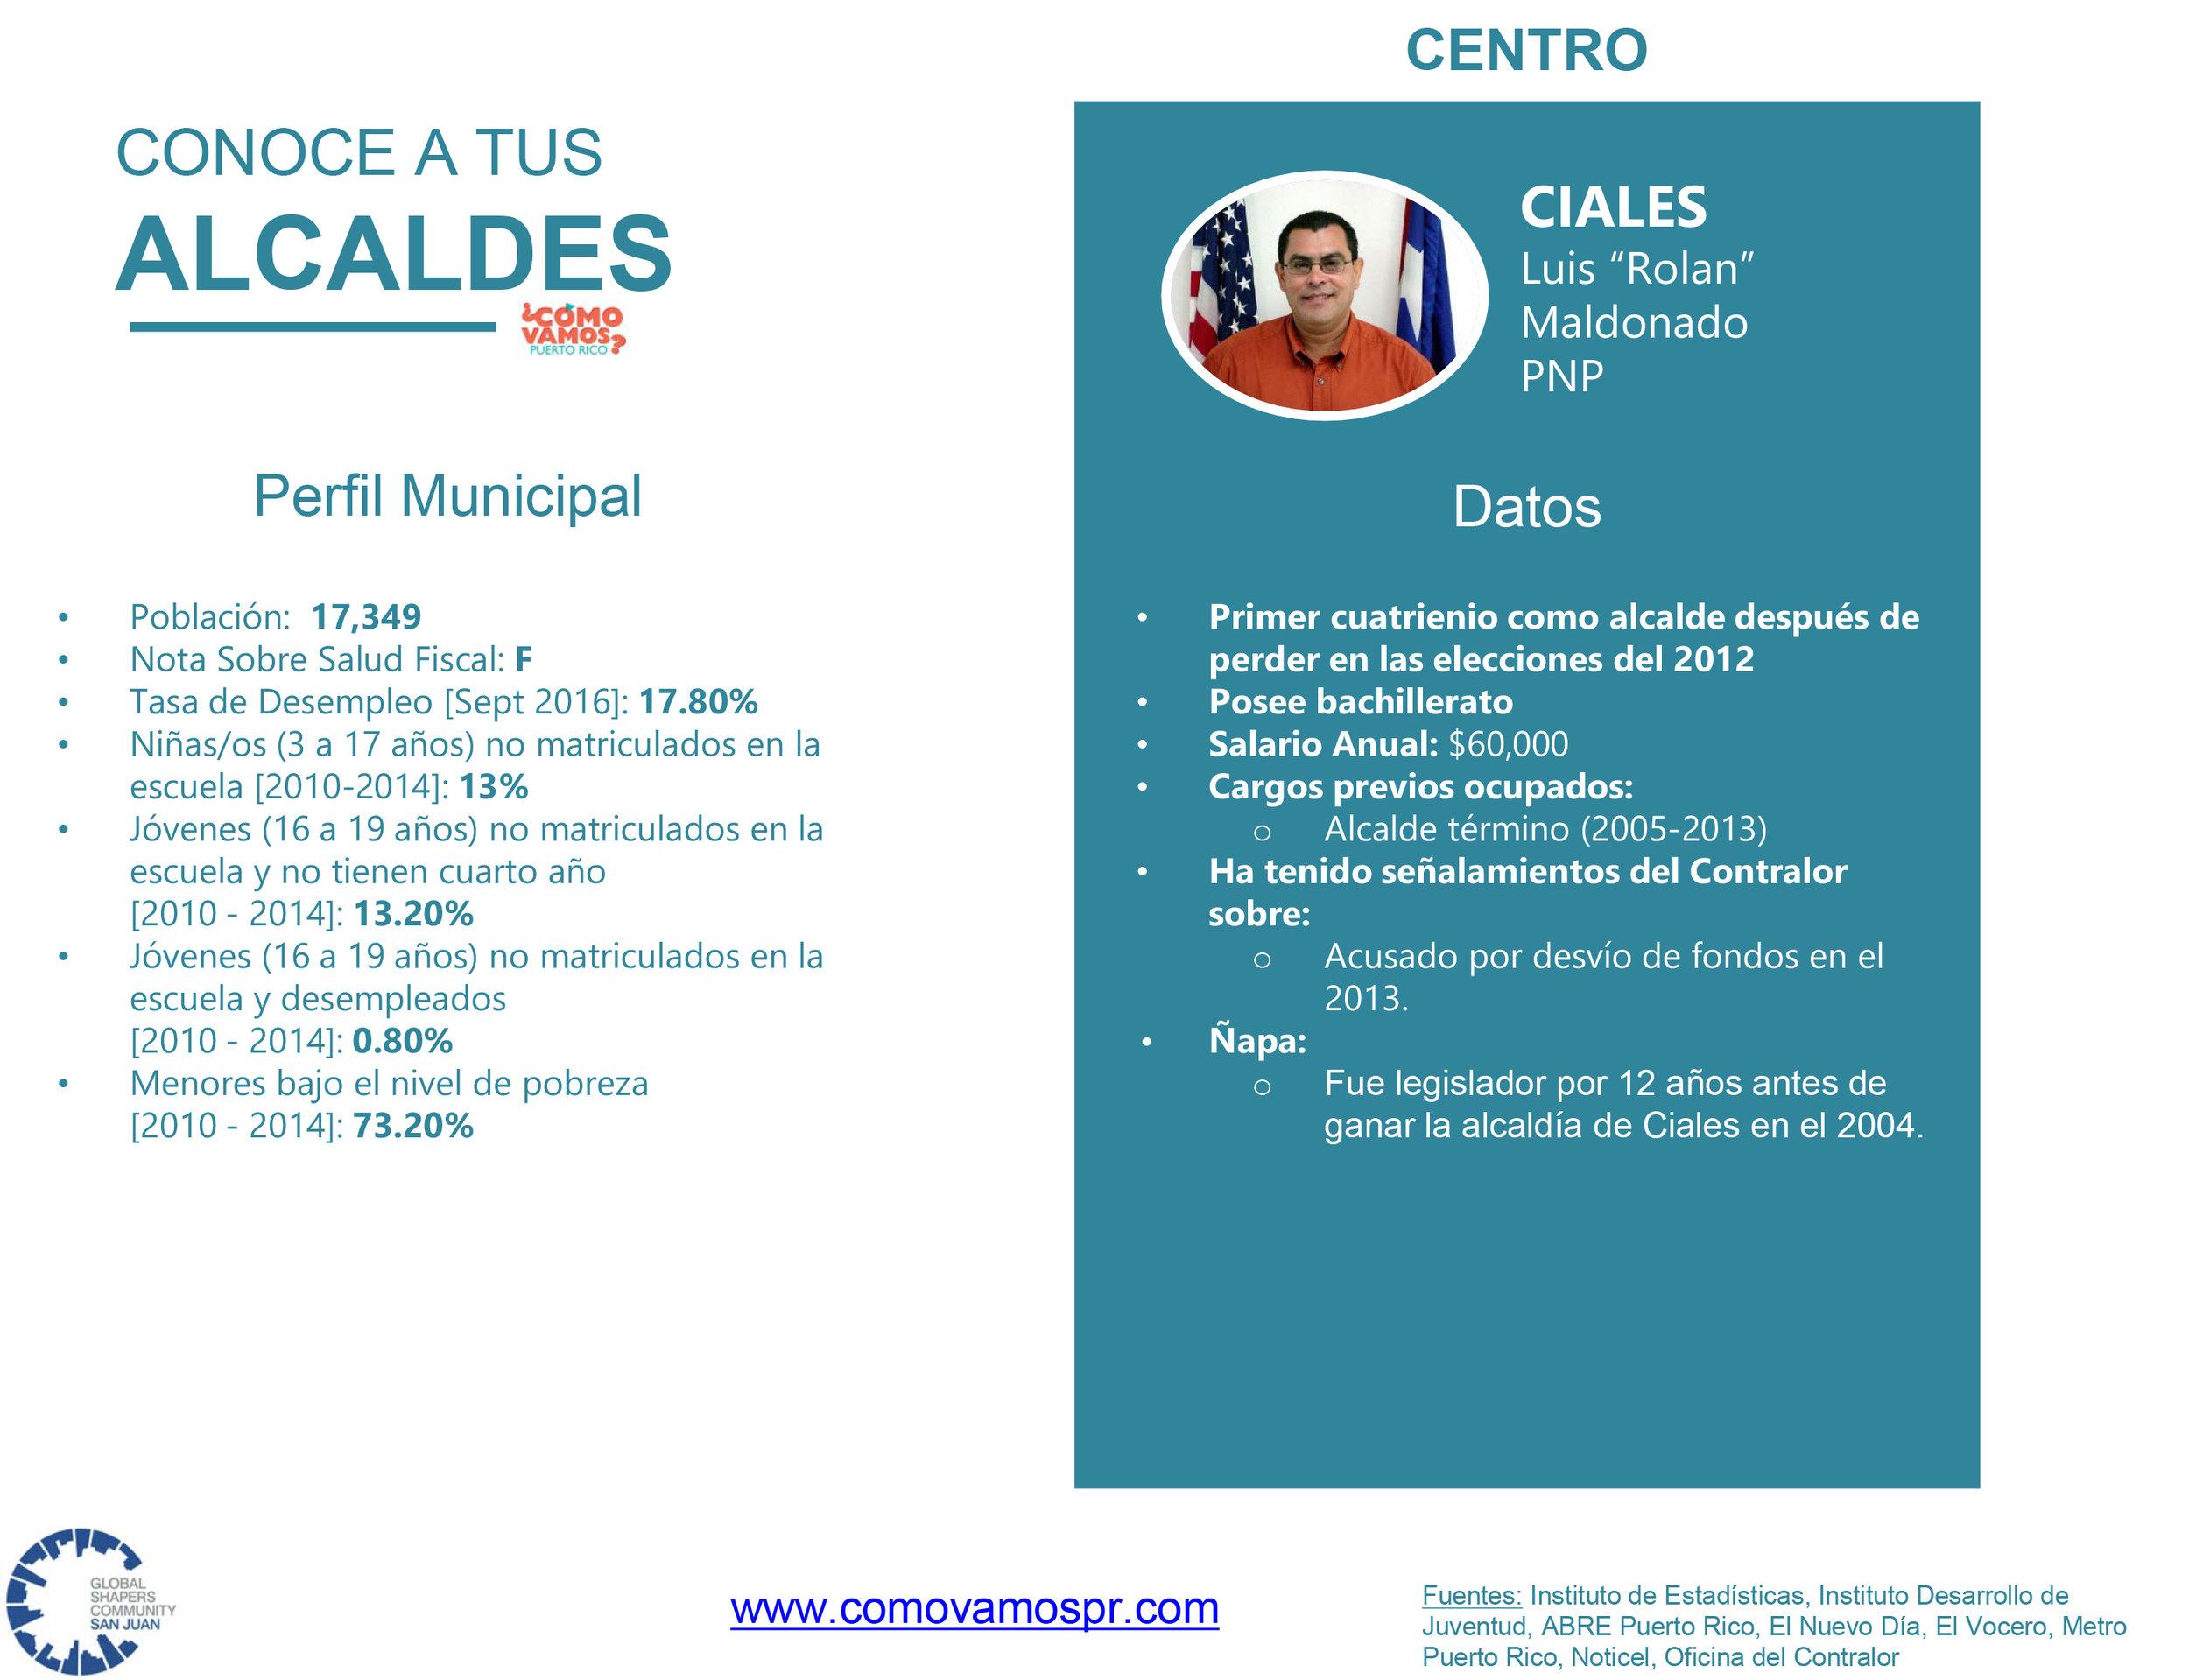 Alcaldes_Centro_Ciales.jpg